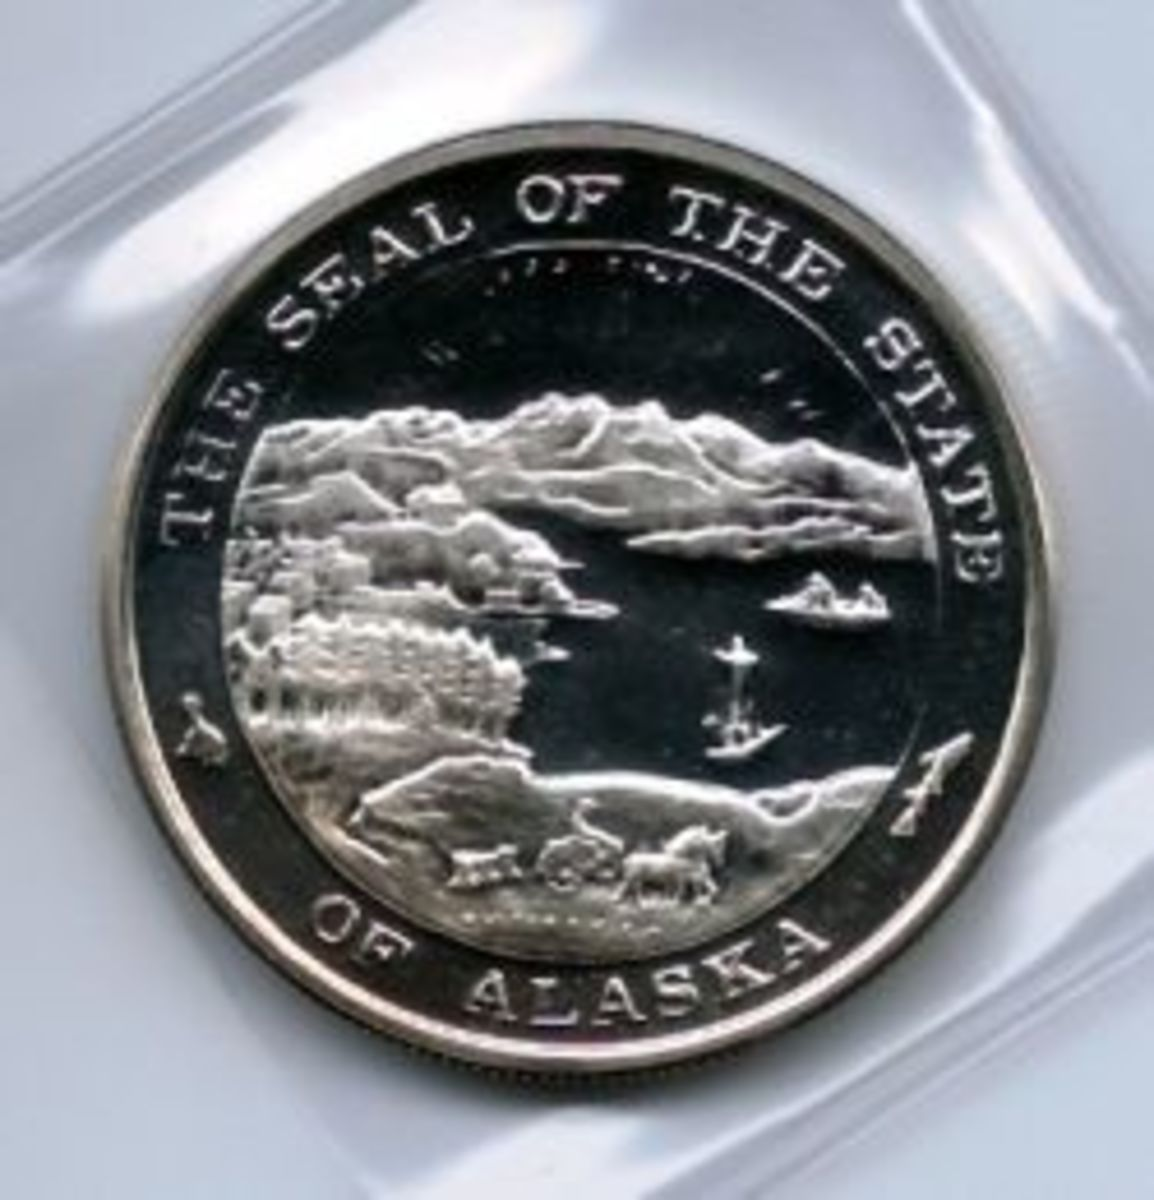 Official Alaska State Medallions